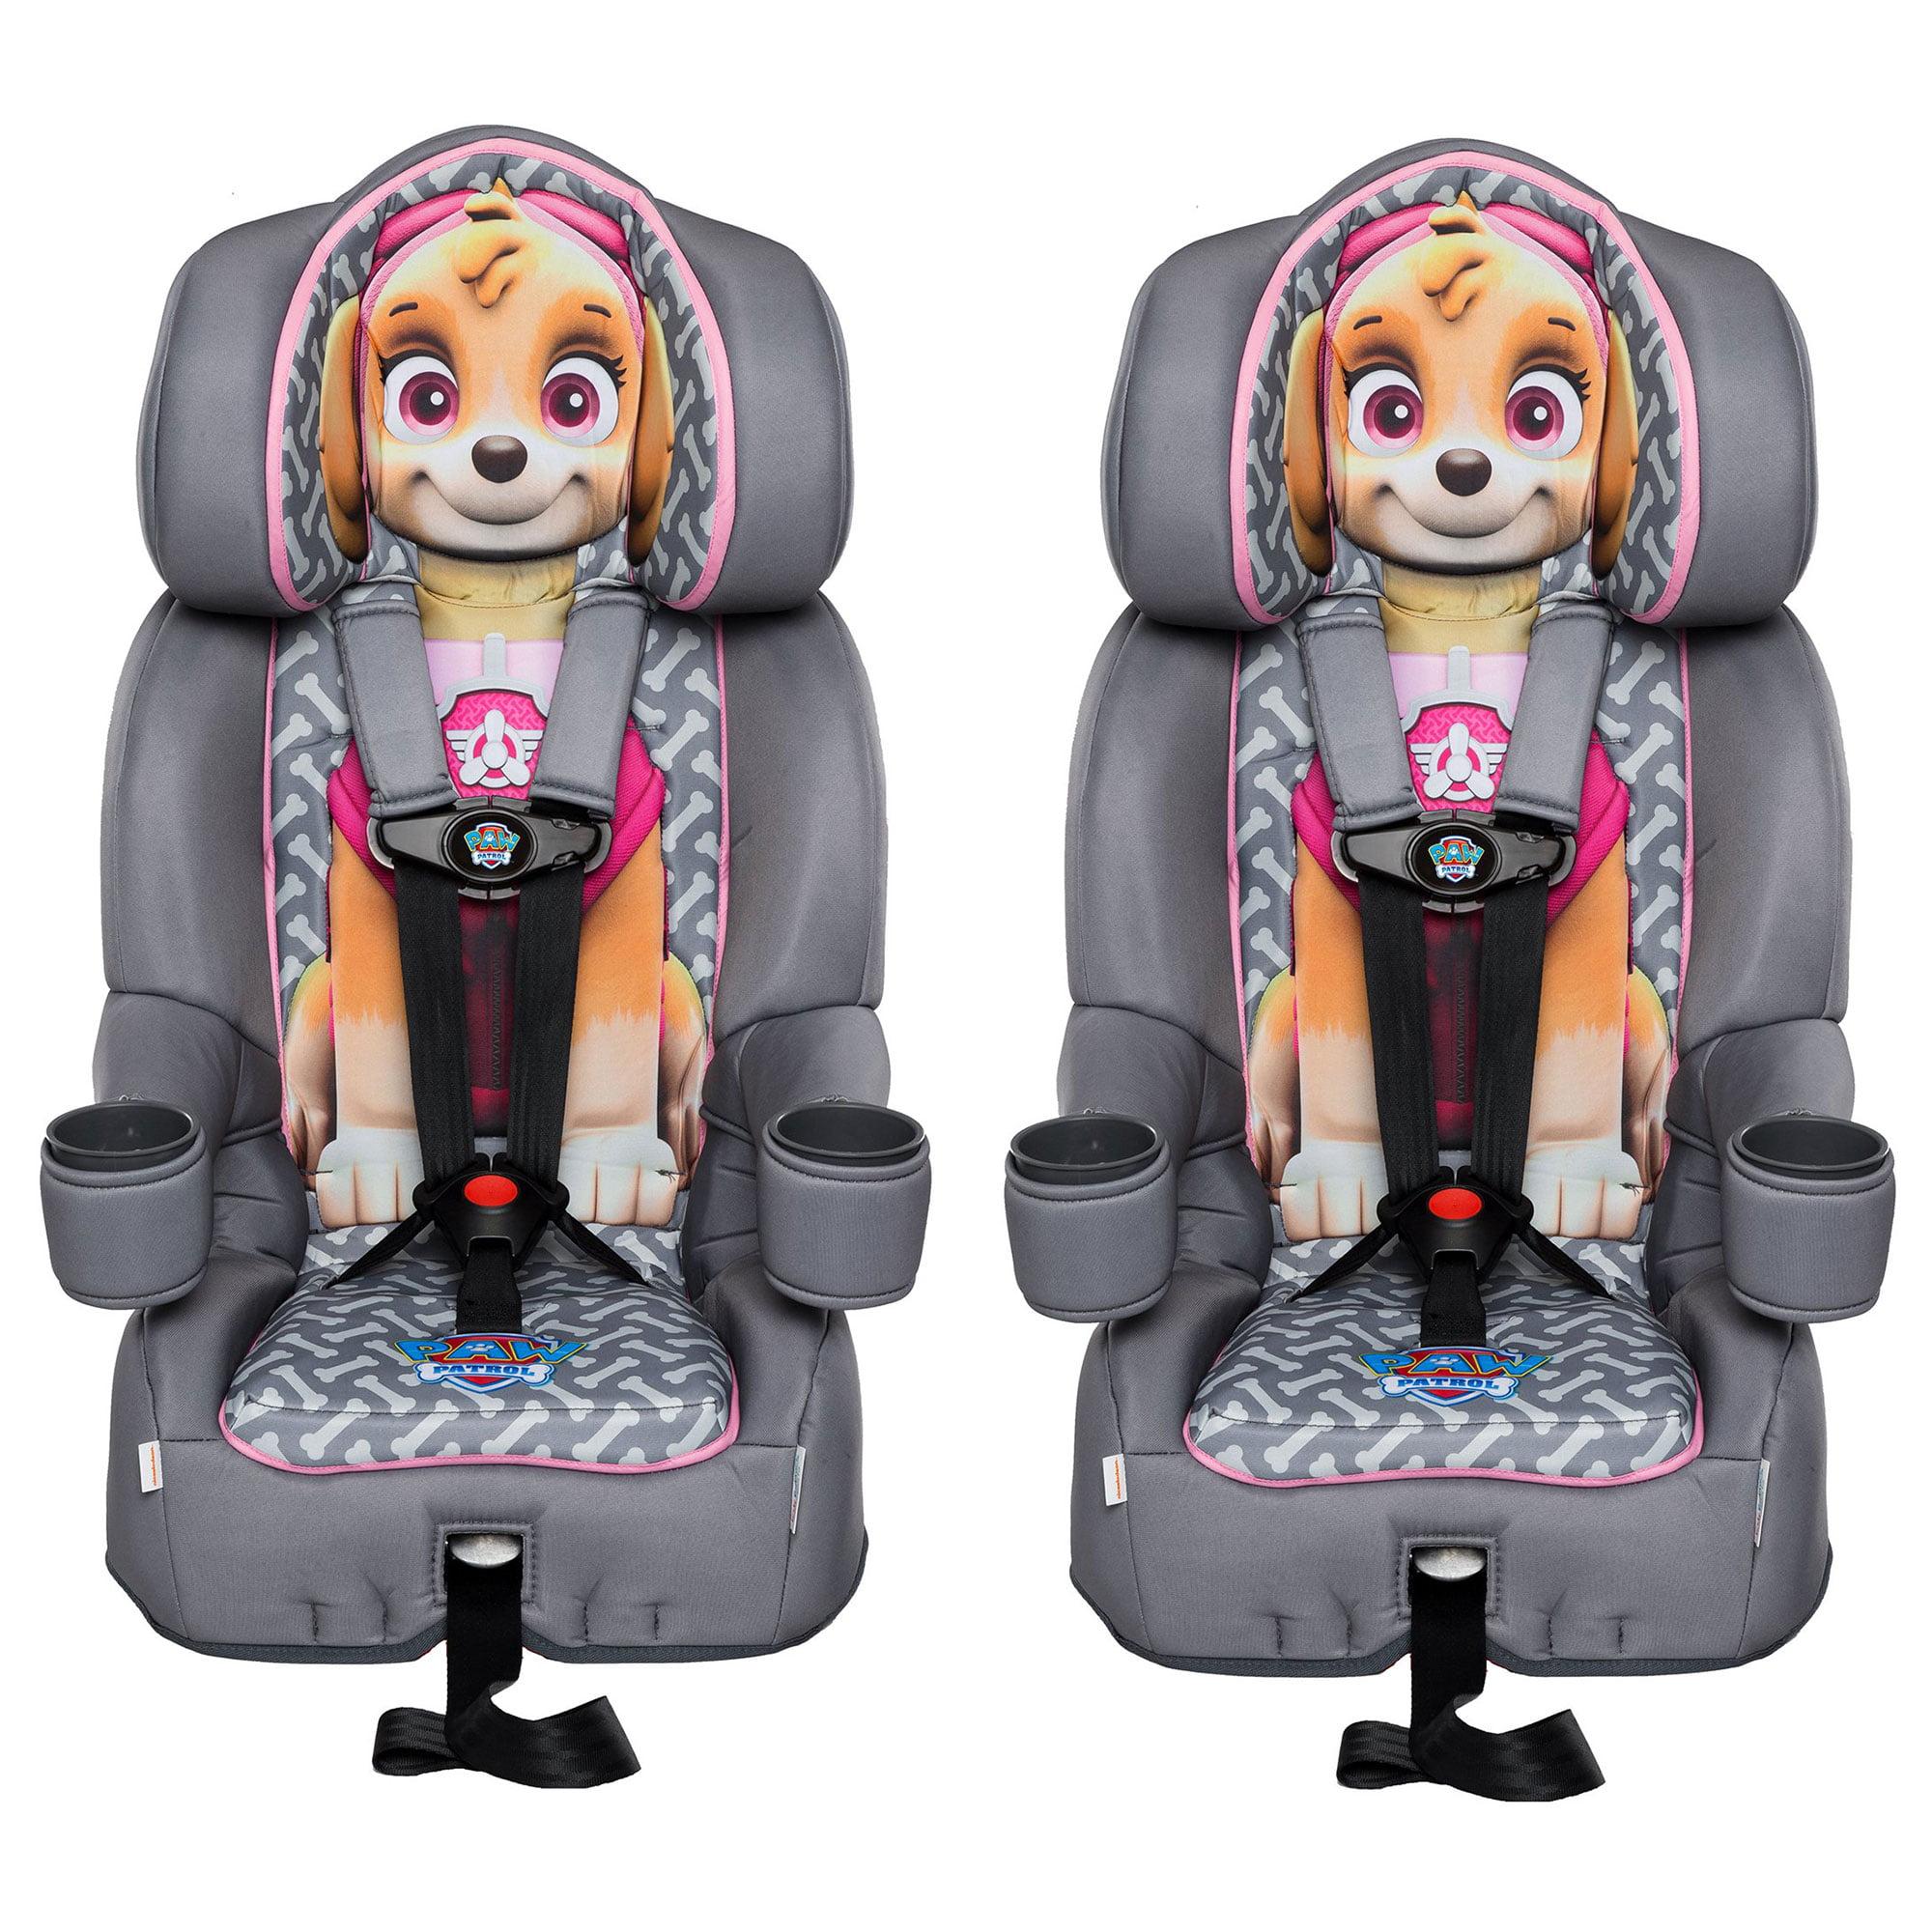 KidsEmbrace Nickelodeon Paw Patrol Skye Harness Booster Car Seat (2 Pack)